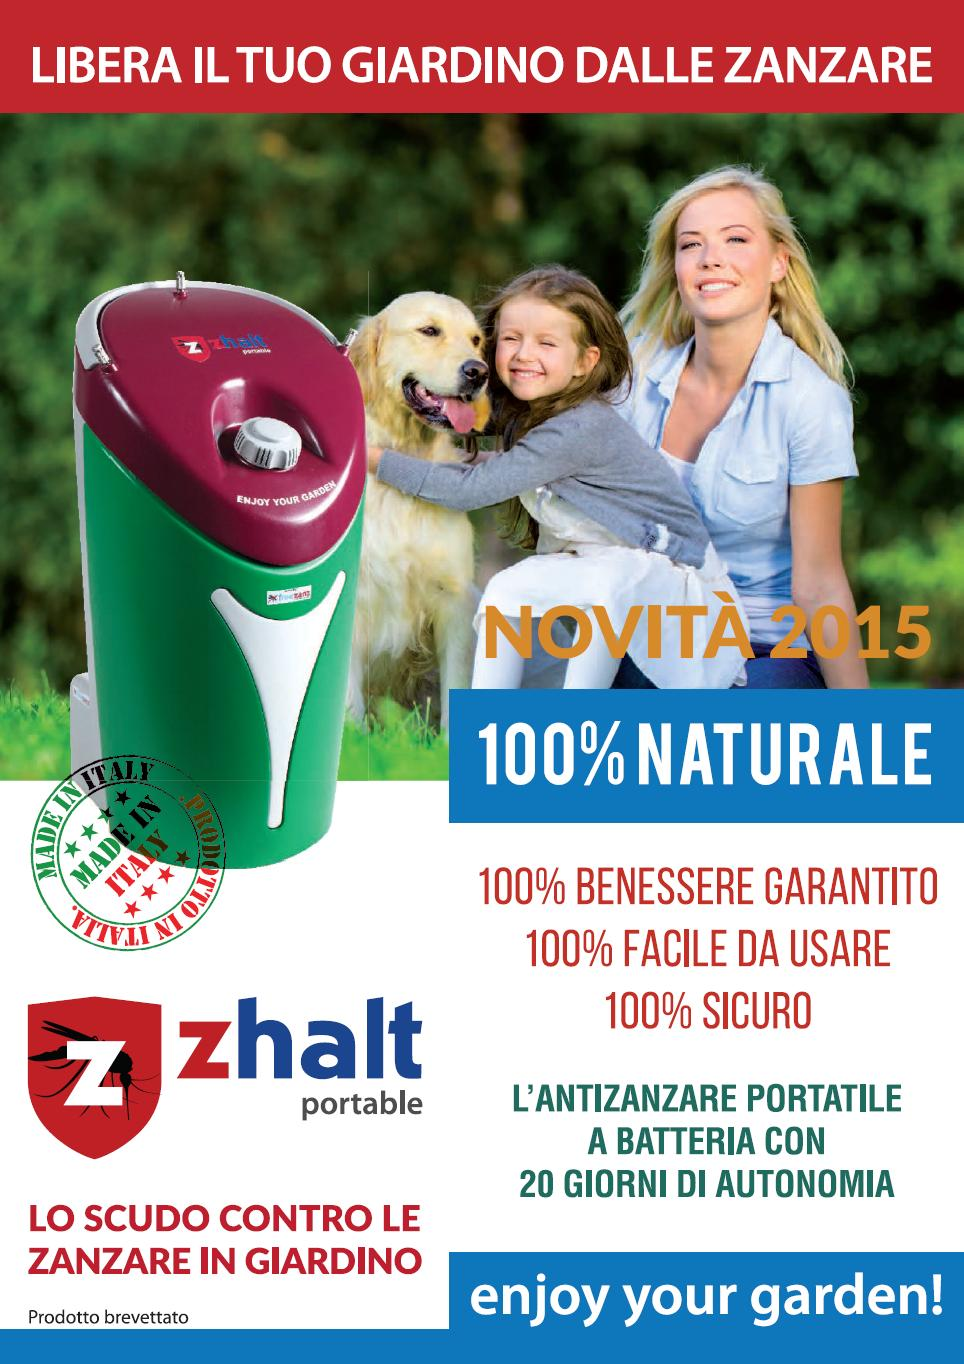 zhalt-portable-1_xs